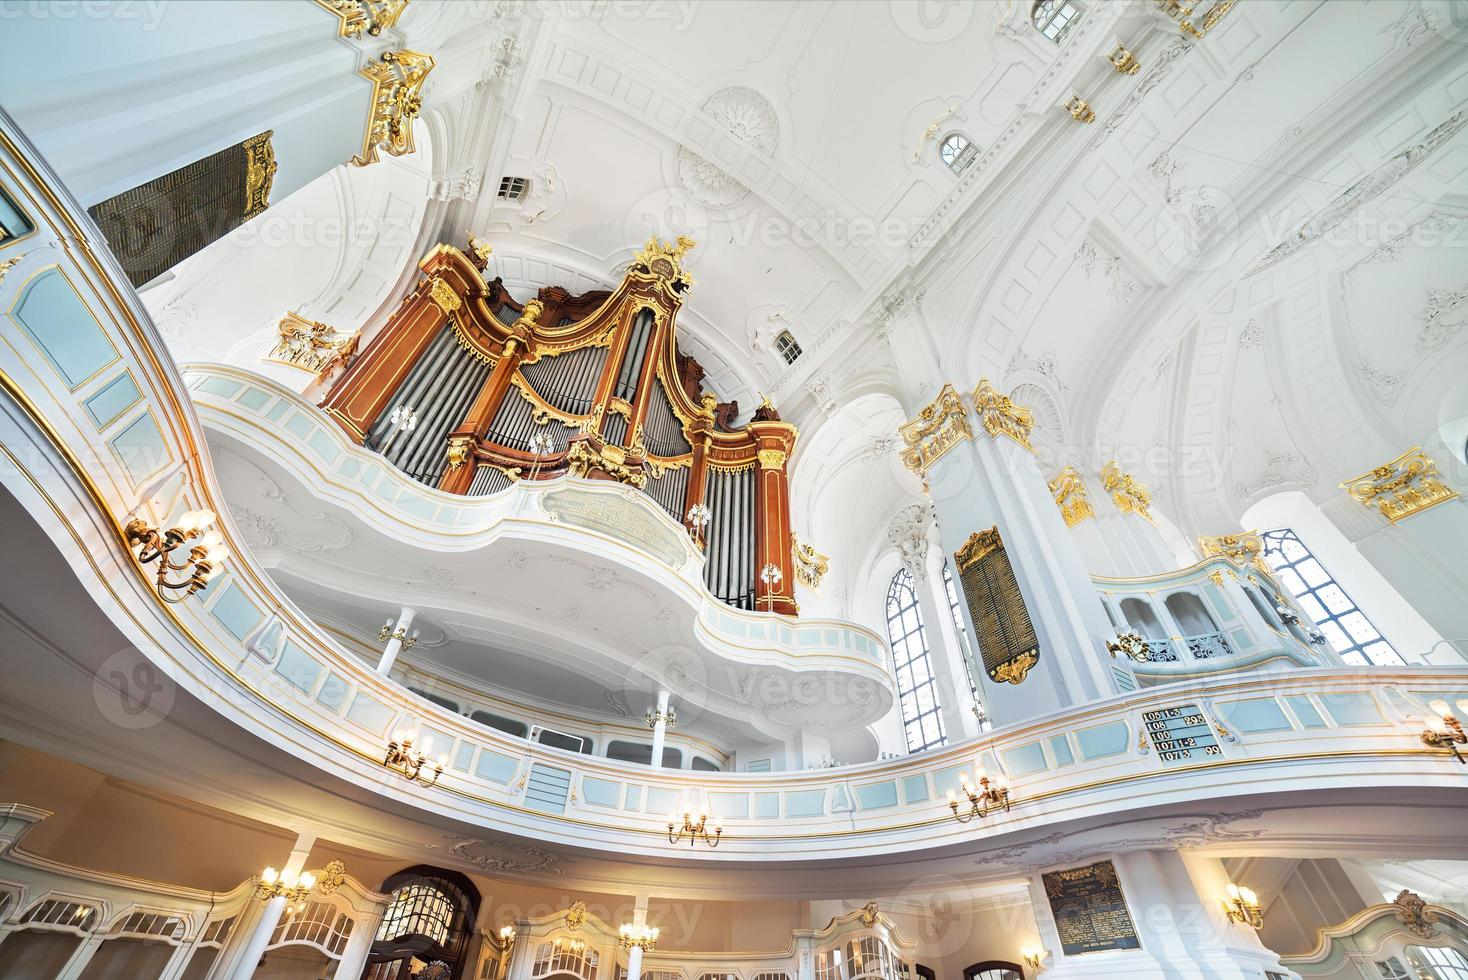 st. Michael kerk in hamburg, interieur foto